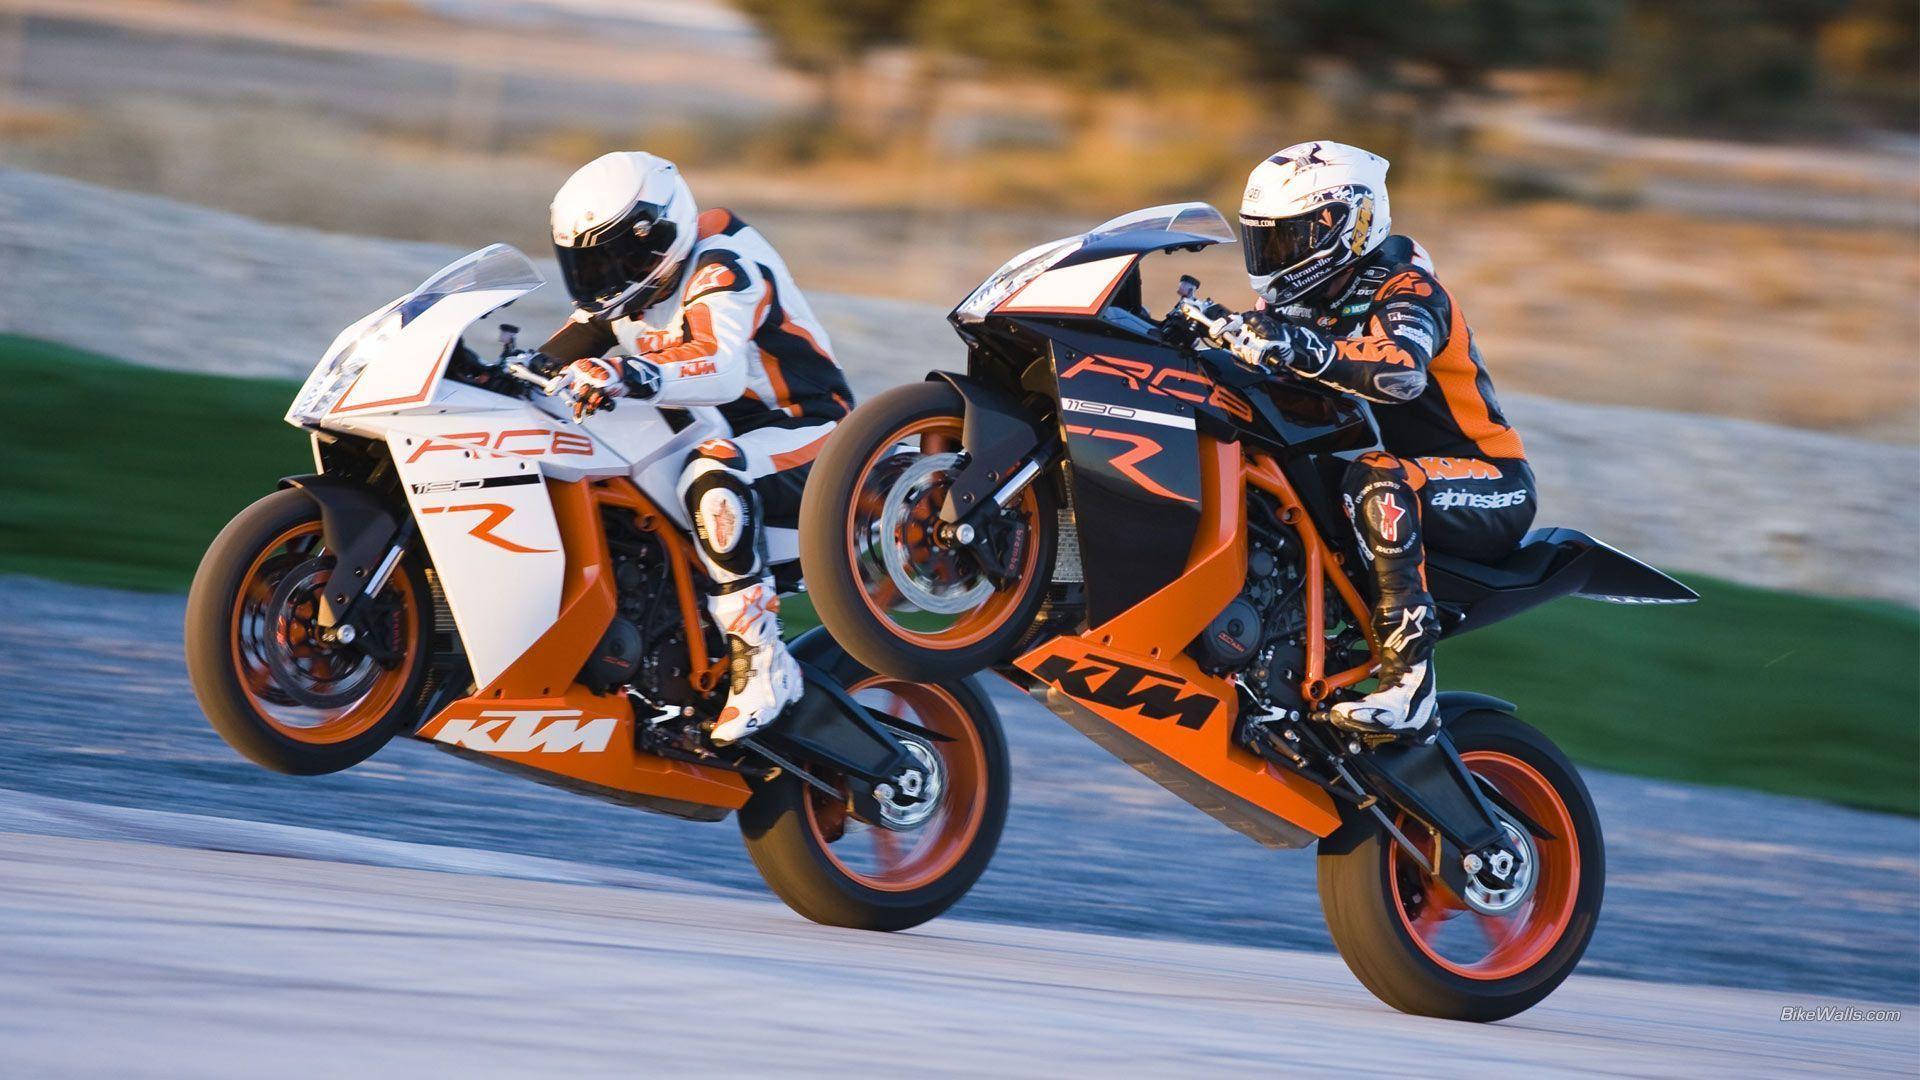 Обои KTM RC8, Мотоцикл, супербайк. Мотоциклы foto 12